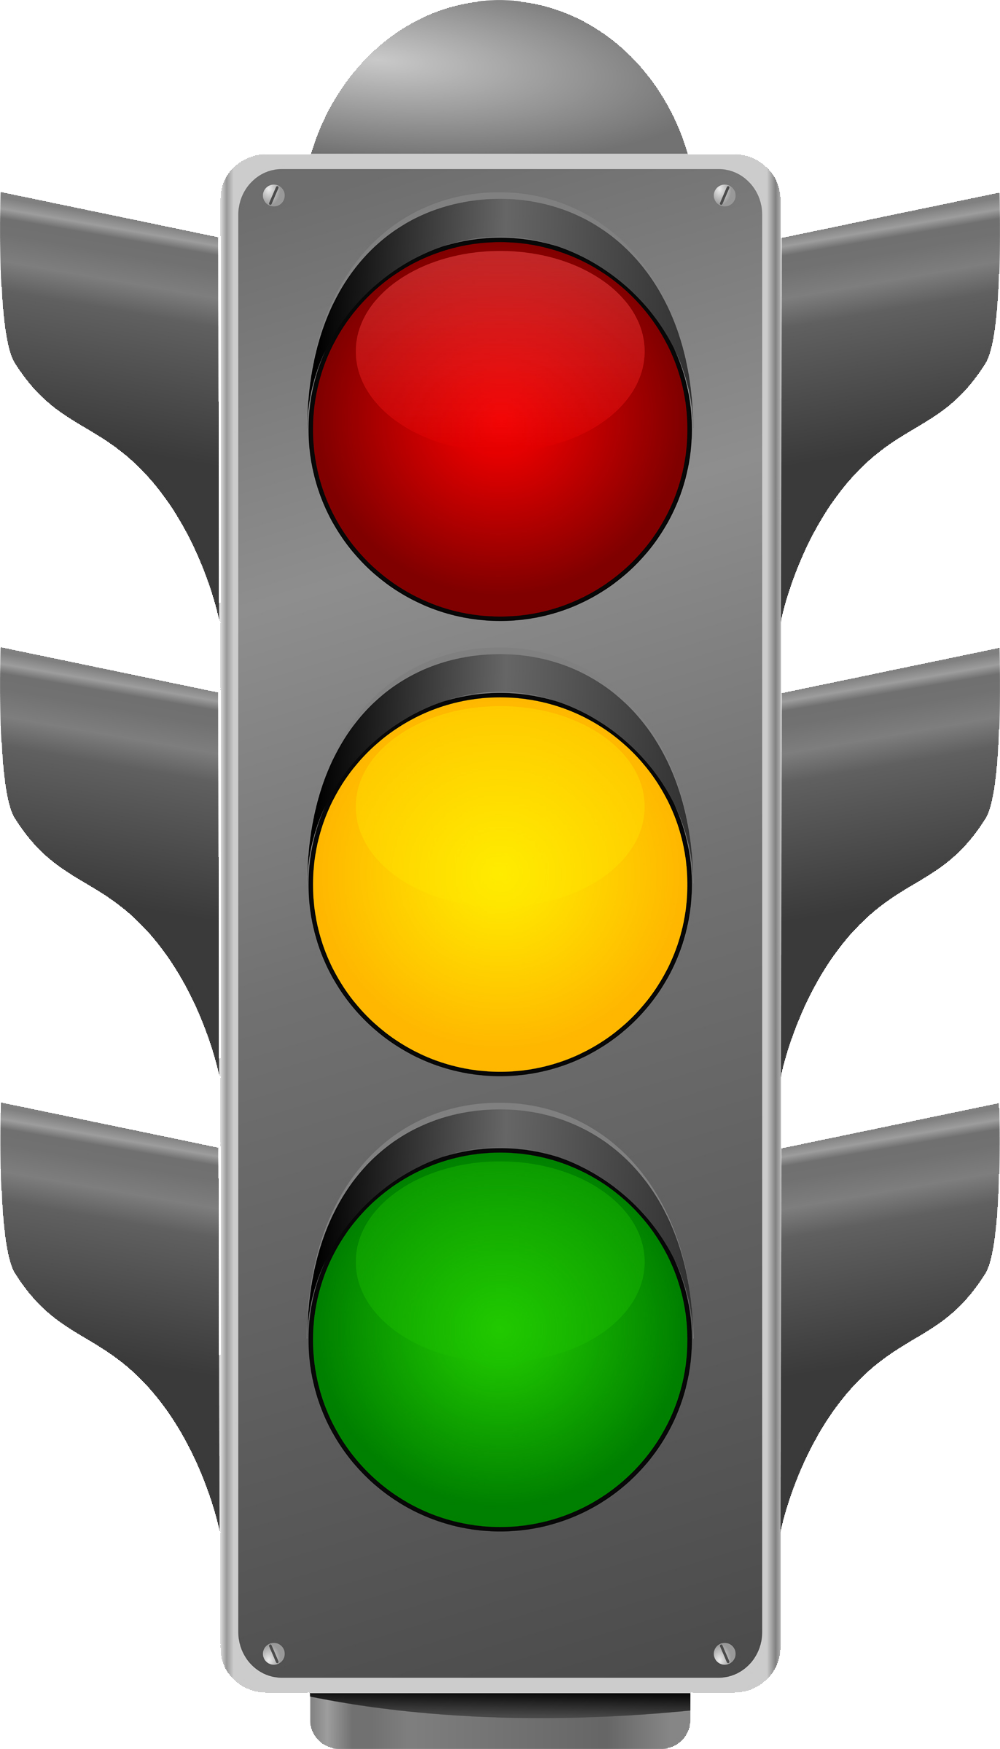 Traffic Lights Png Image Purepng Free Transparent Cc0 Png Image Library Traffic Light Sign Traffic Light Traffic Signal